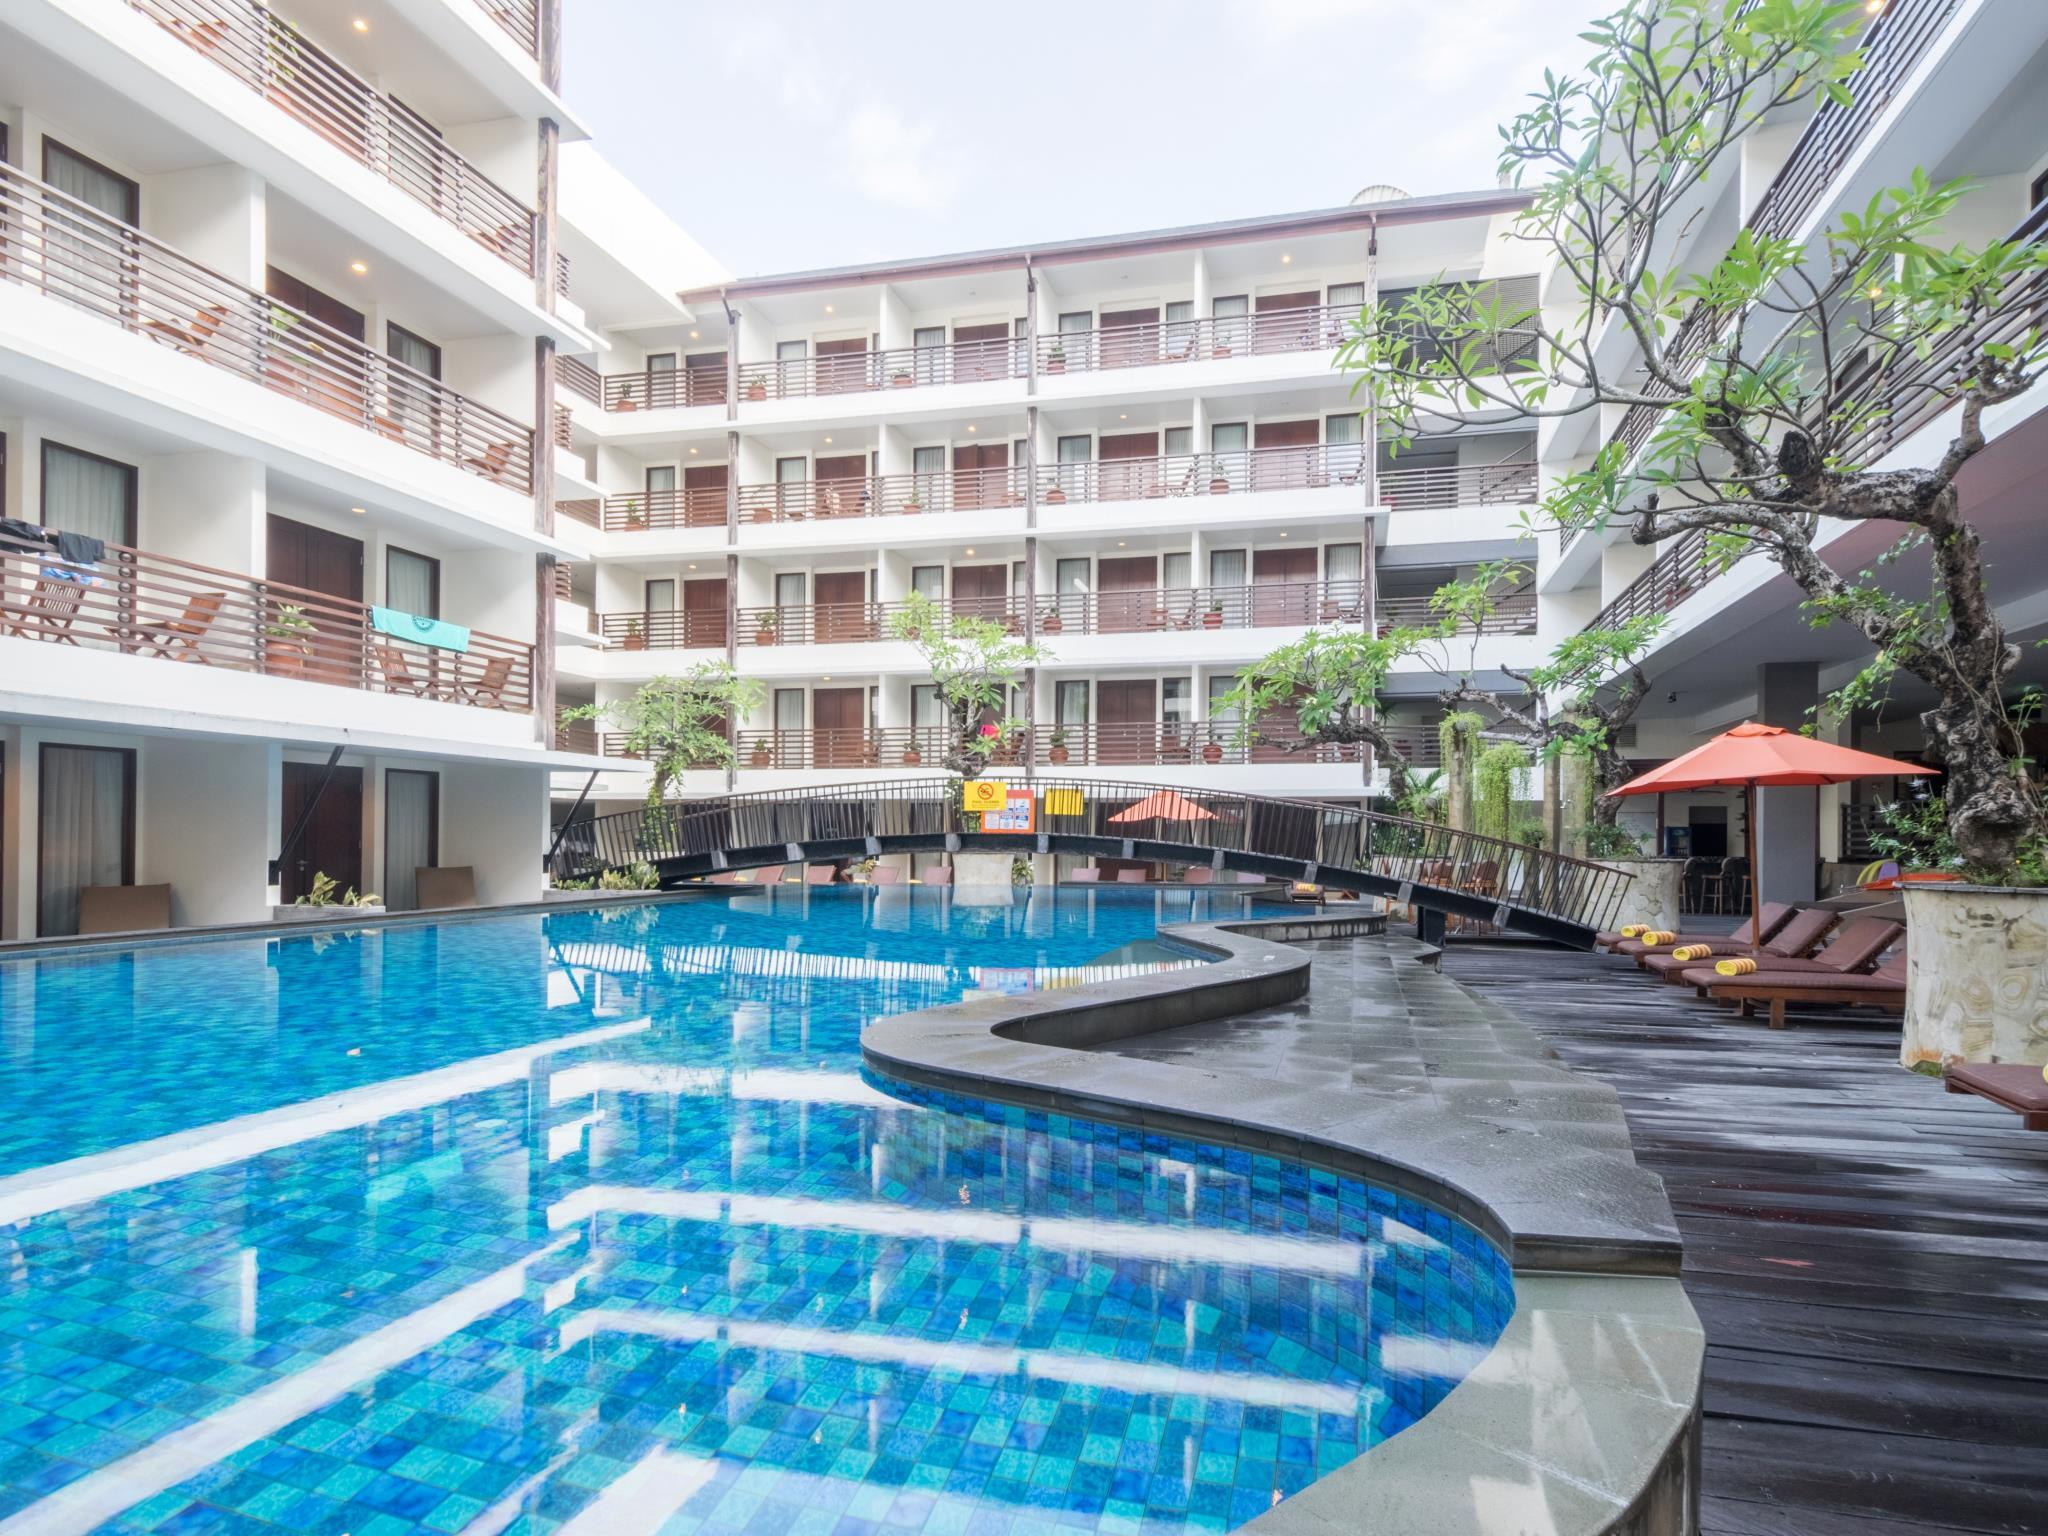 Sun Island Hotel Spa Kuta Bali Indonesia Mulai Dari Rp